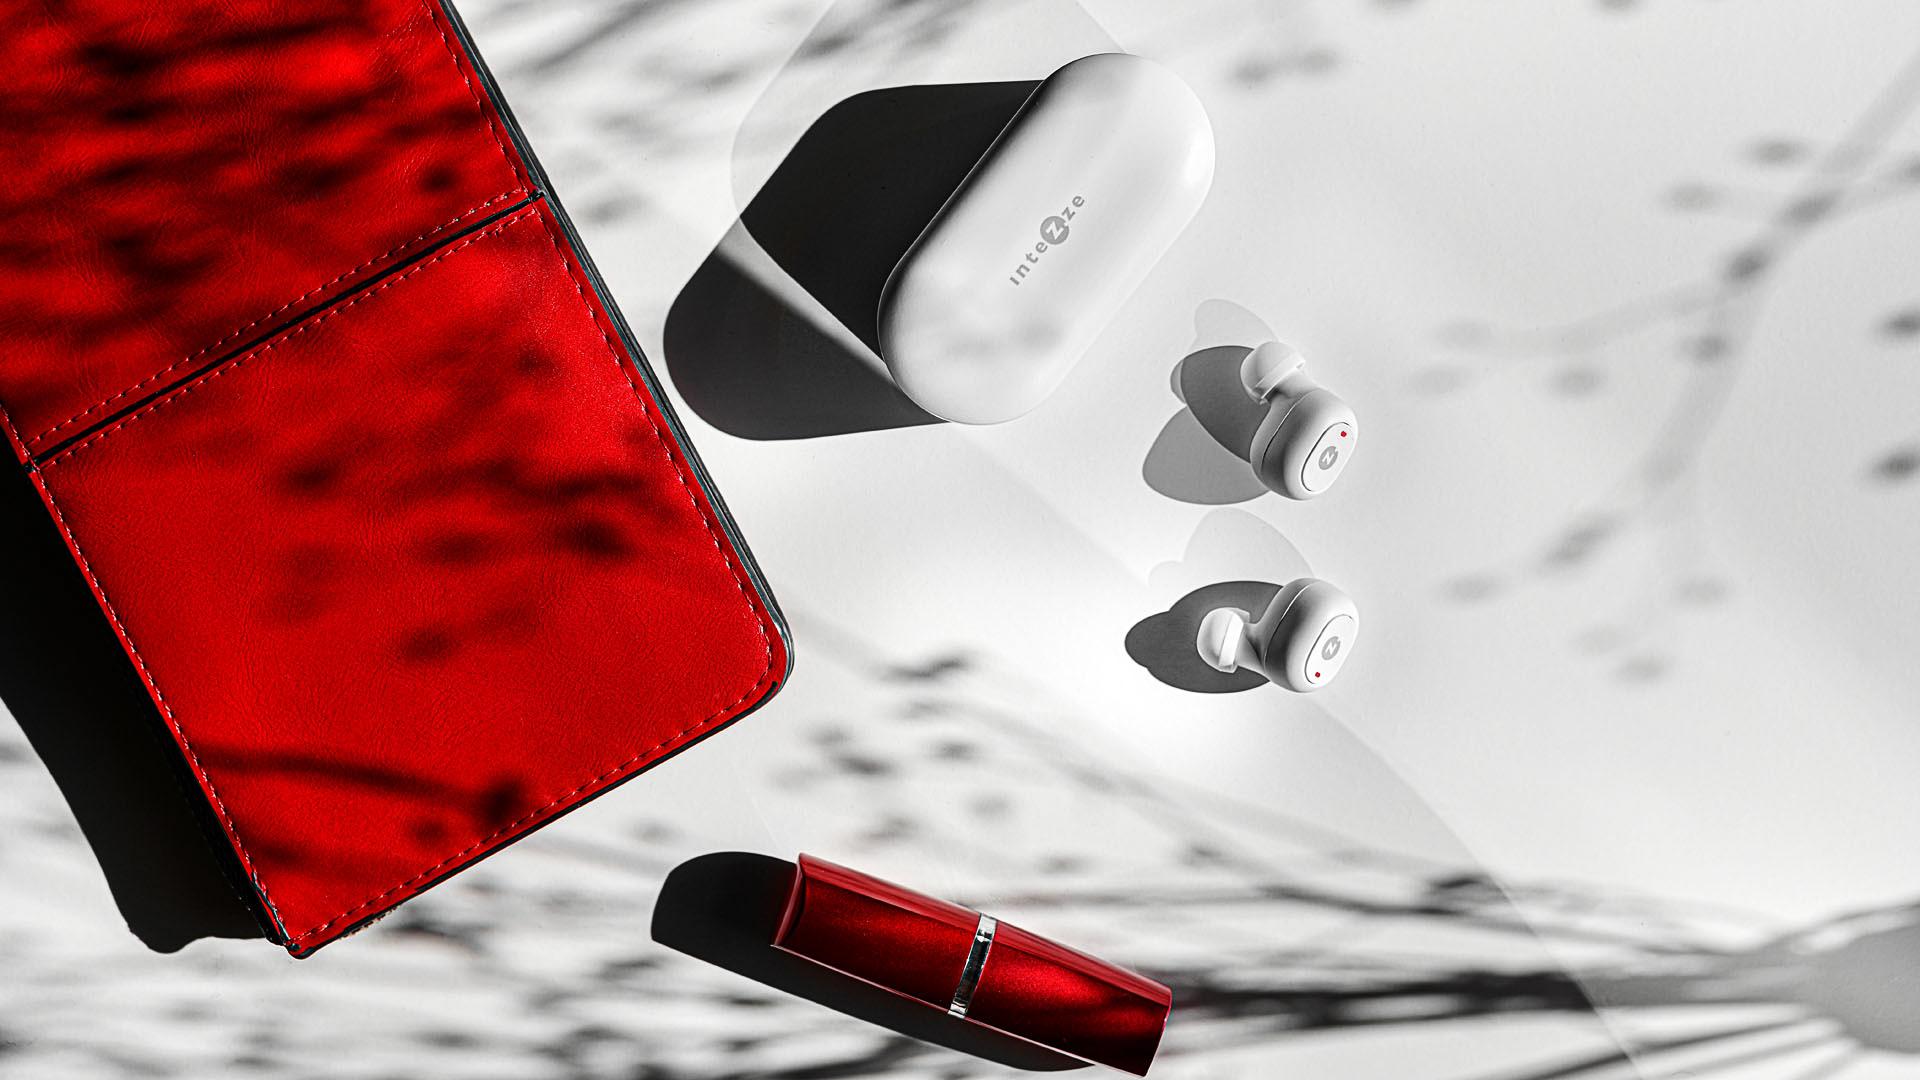 Focení produktu-sluchátka intezze piko